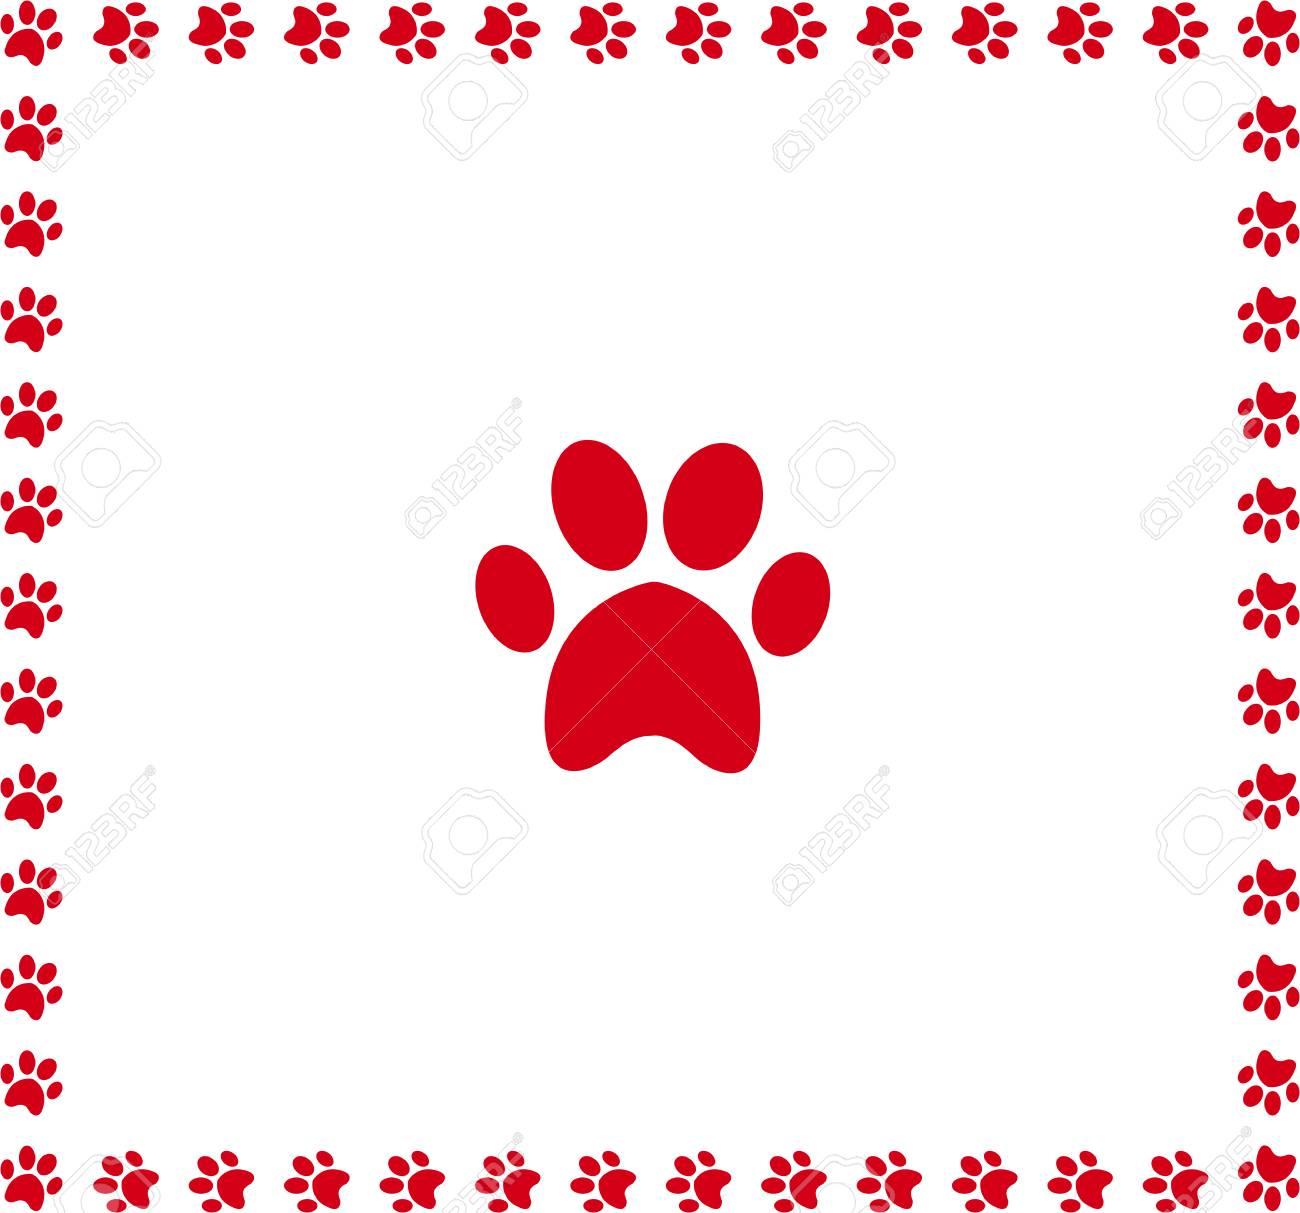 red animal pawprint icon framed with paw prints square border rh 123rf com Tiger Paw Print Clip Art Dog Paw Border Clip Art